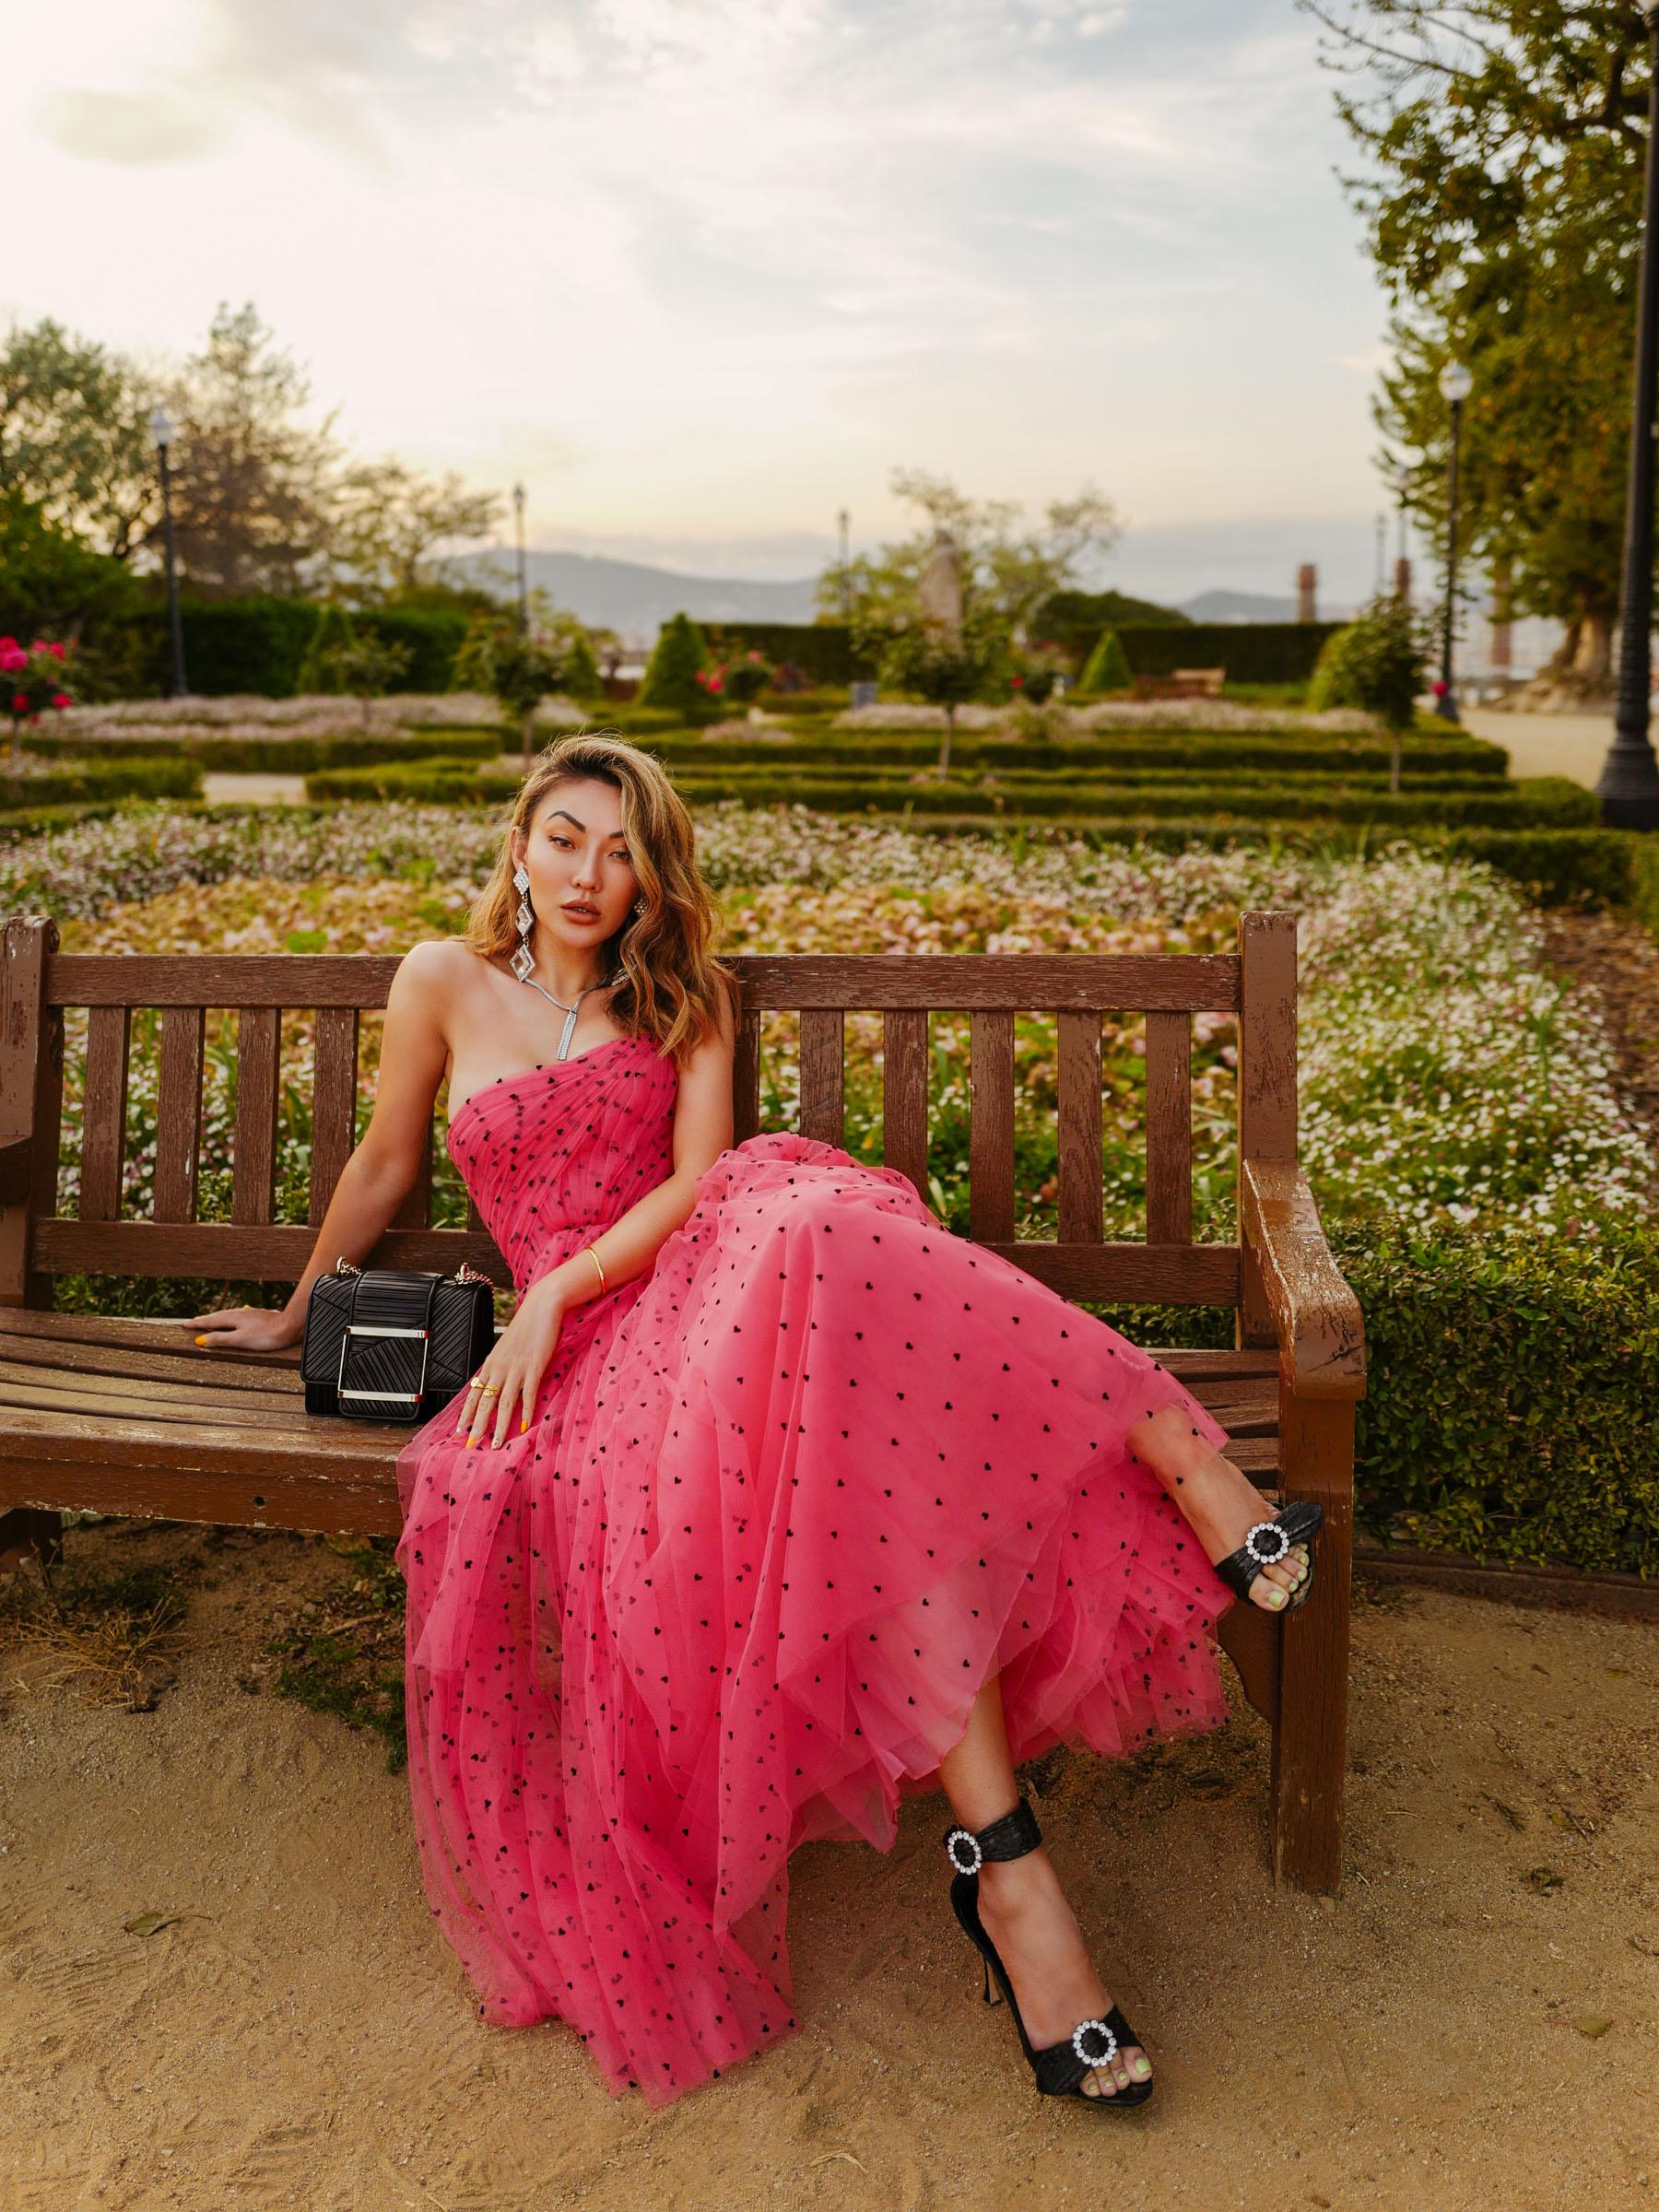 best fabrics to wear in the summer, carolina herrera chiffon dress, pink chiffon dress // Notjessfashion.com